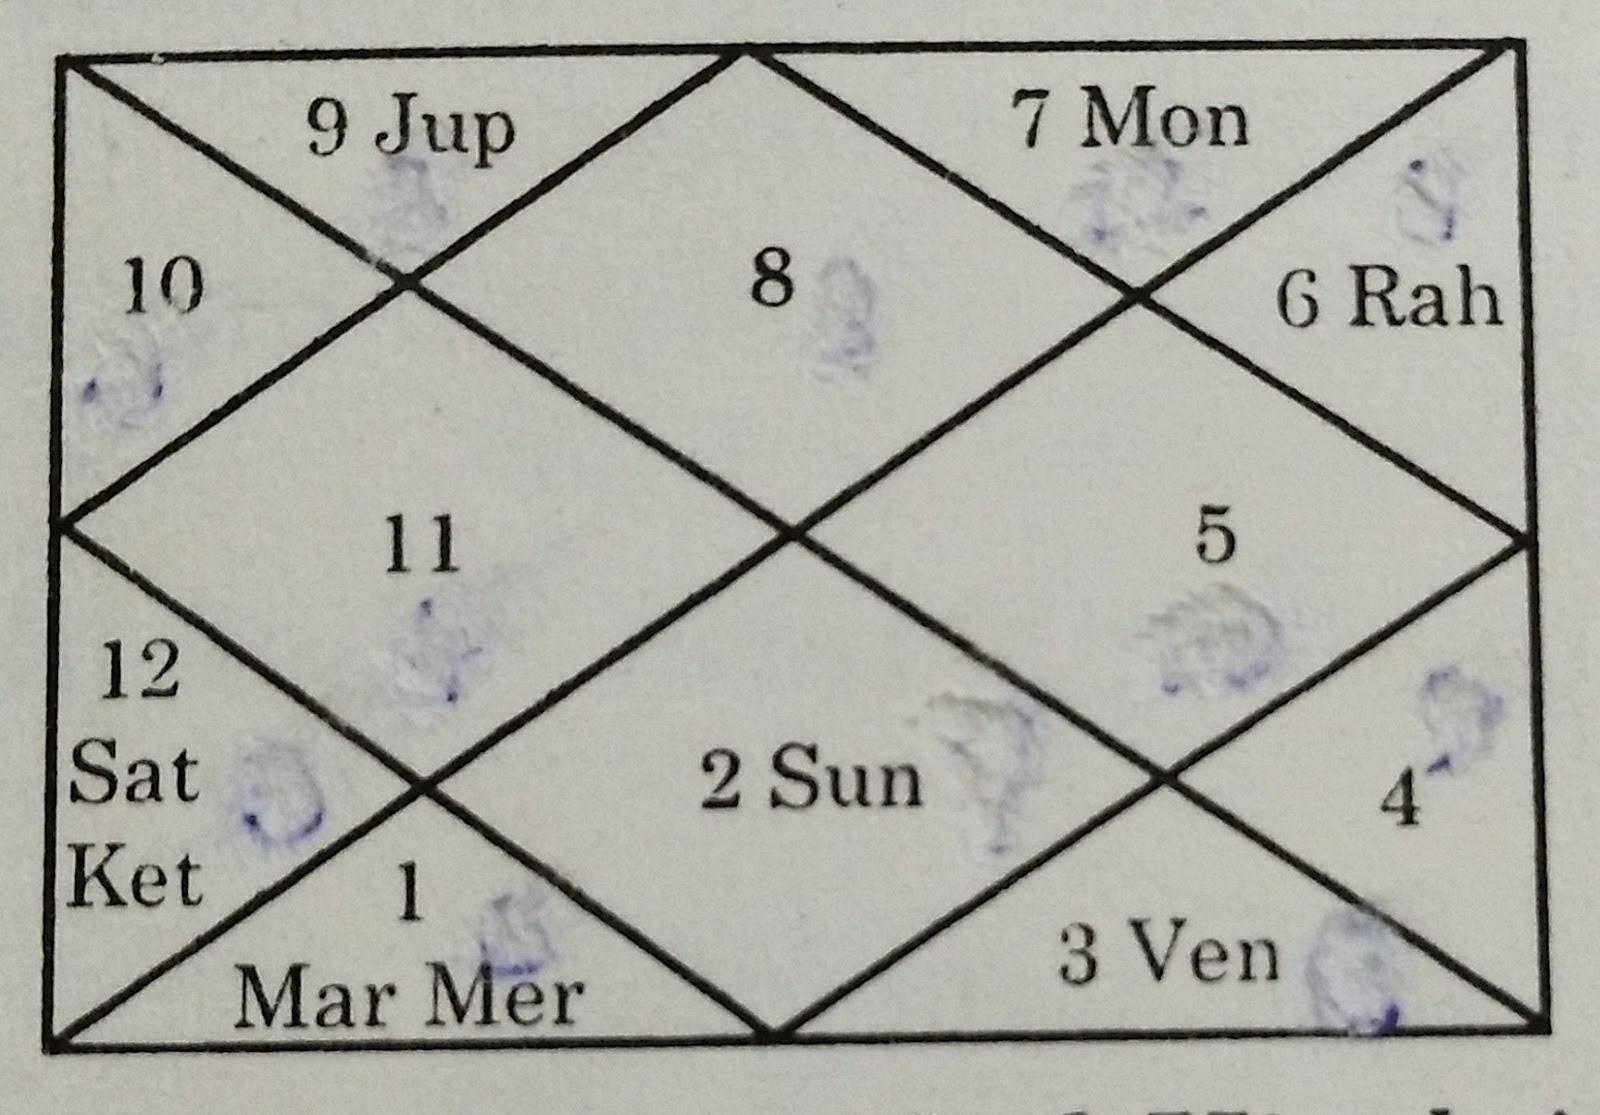 Lal kitab astrology lal kitab astrology indian astrology 3151996 nvjuhfo Gallery